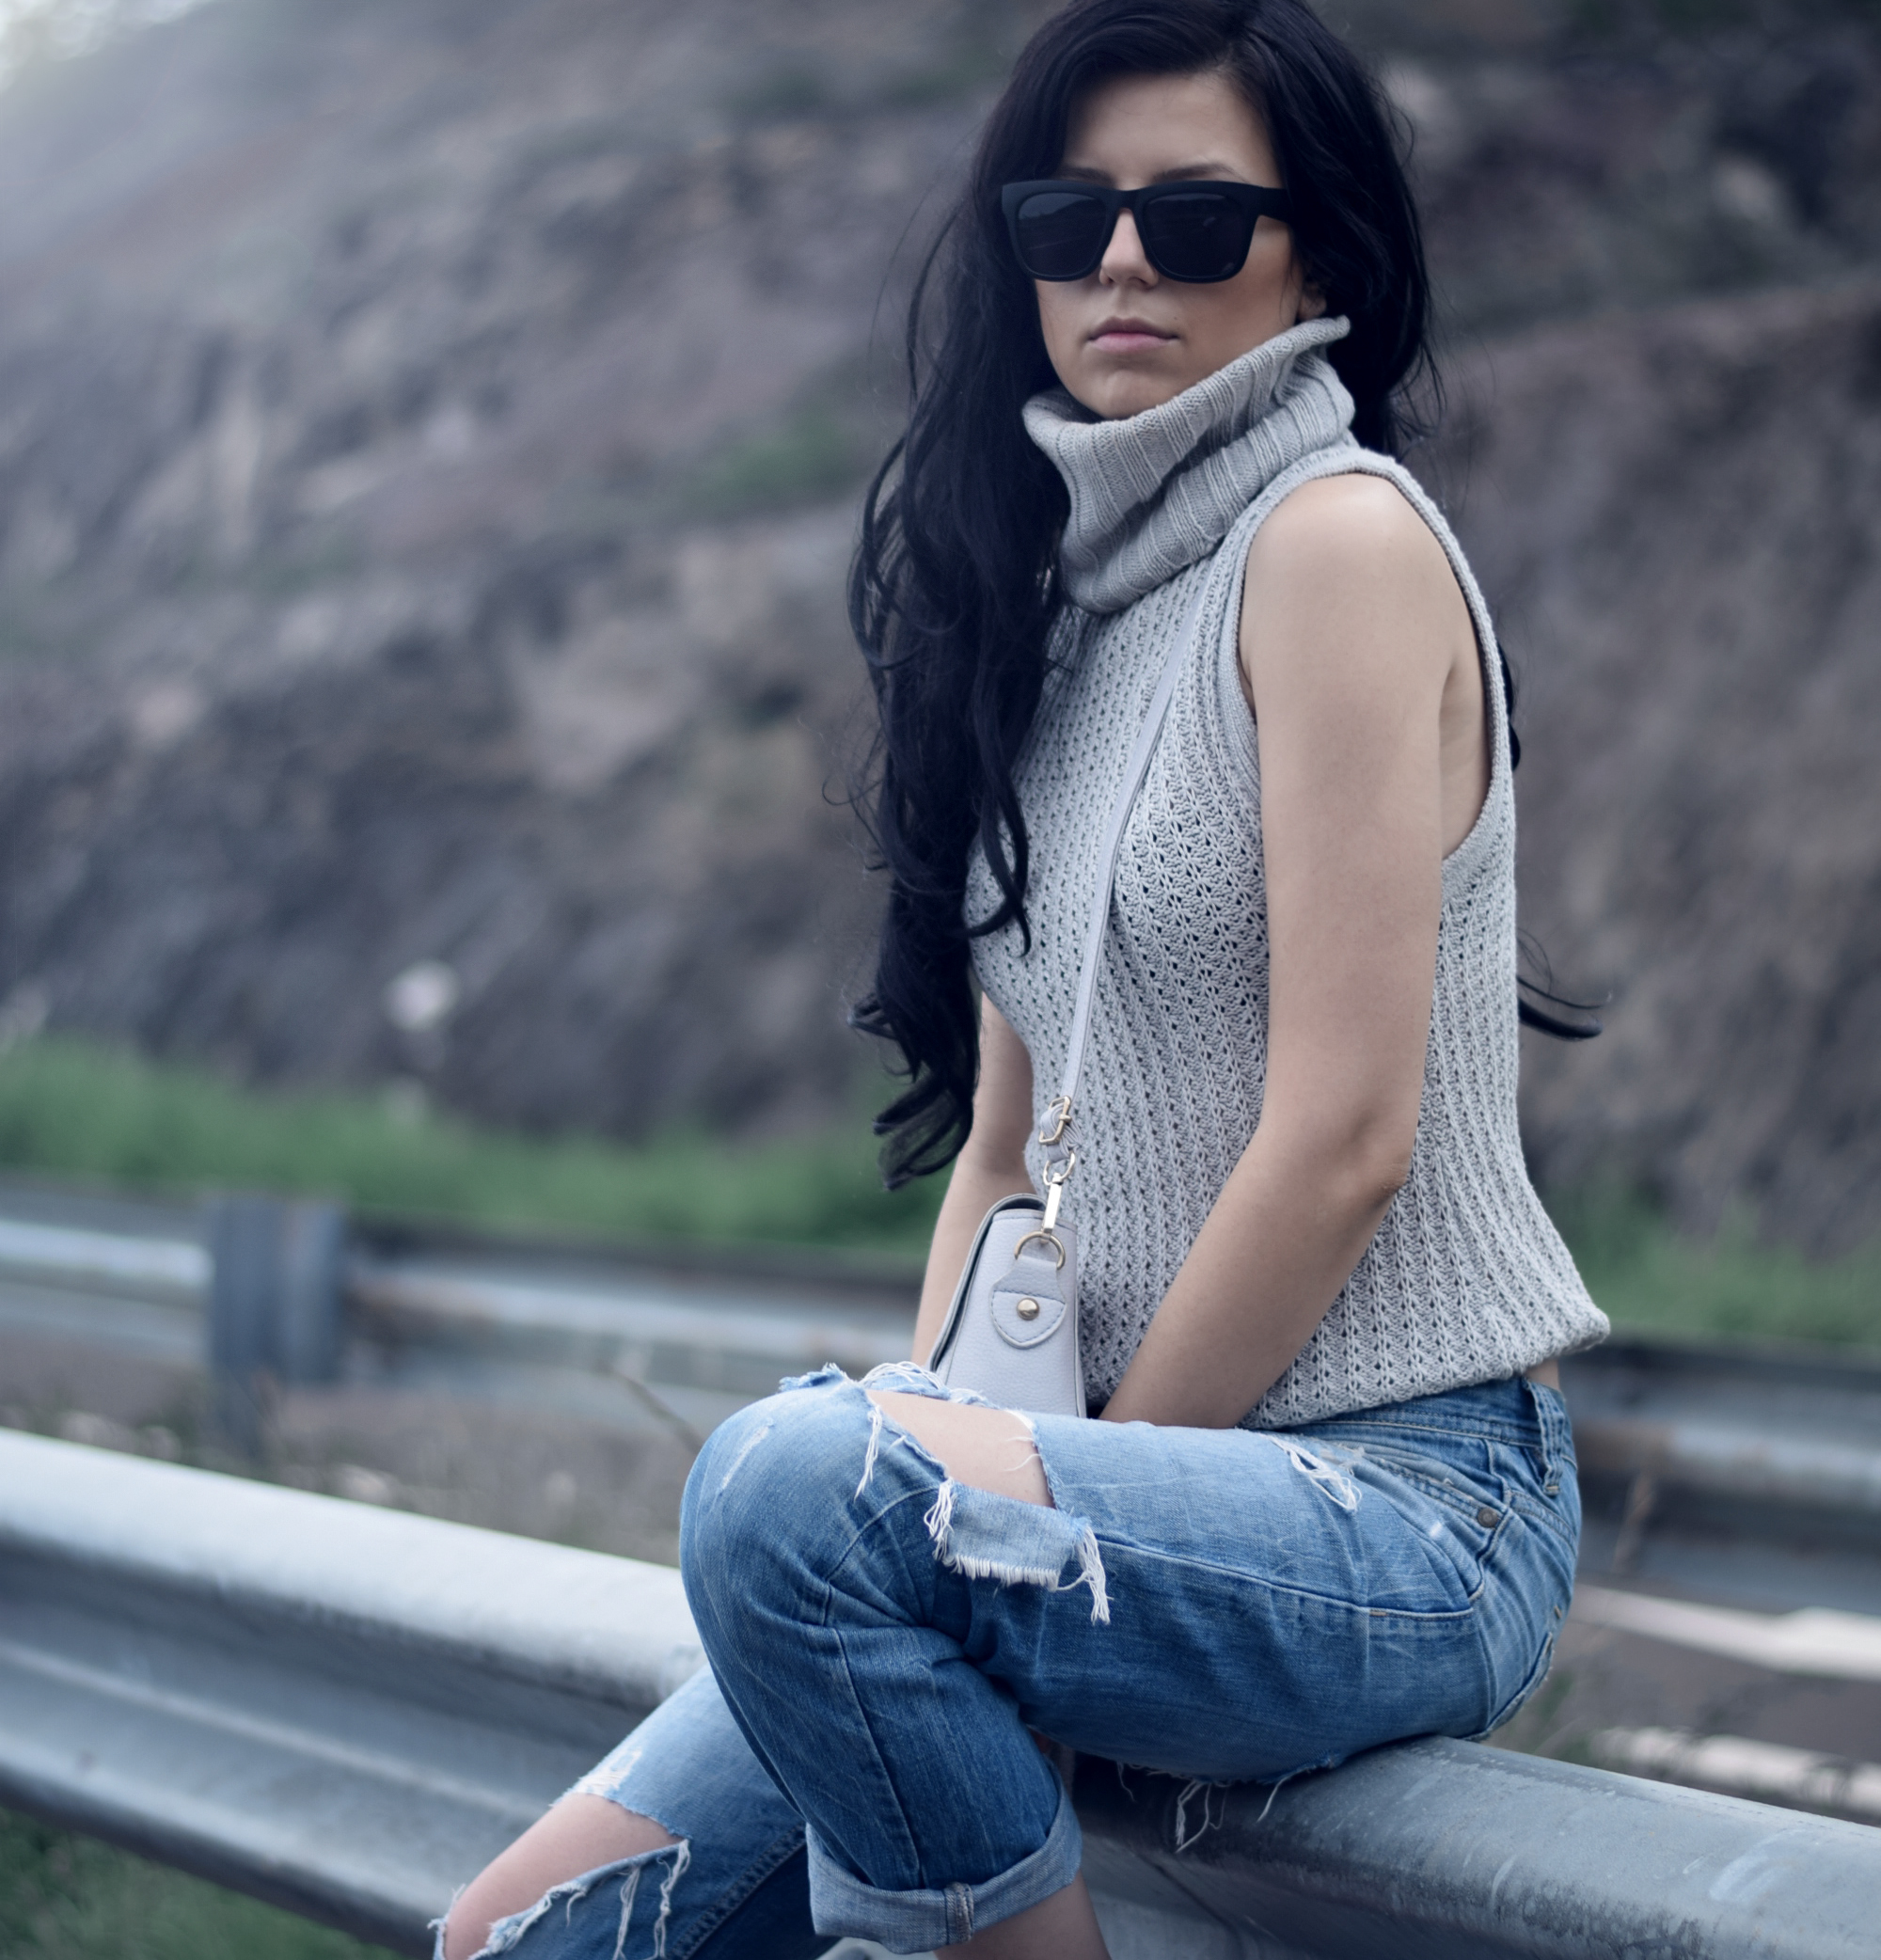 klarge chunky knit vest turtle neck fashionblogger photography ripped blue jeans